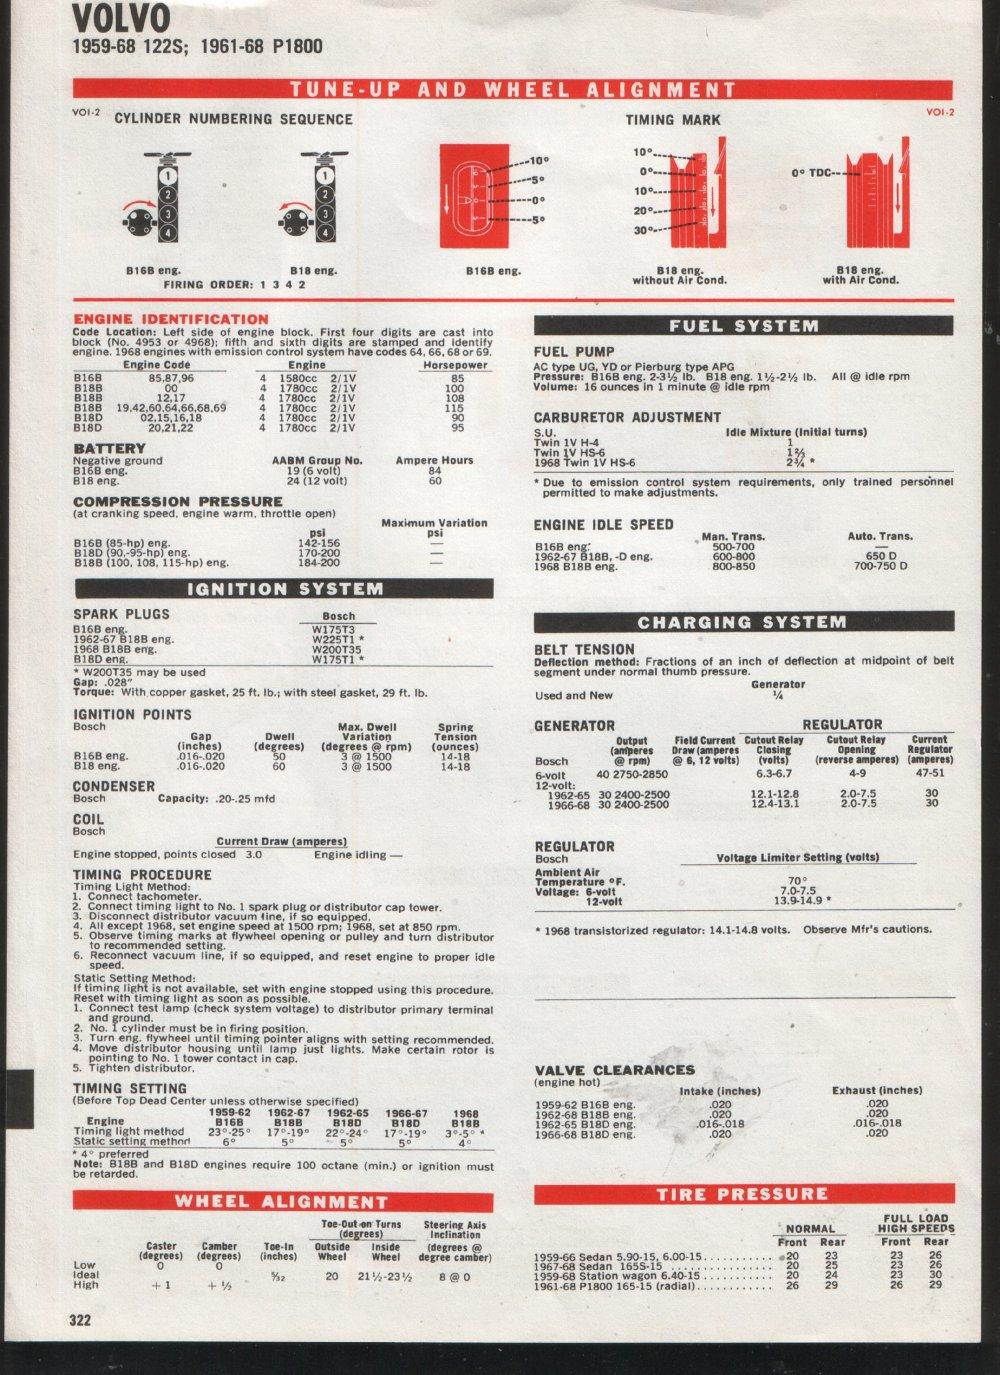 Volvo P1800 Documentation main page